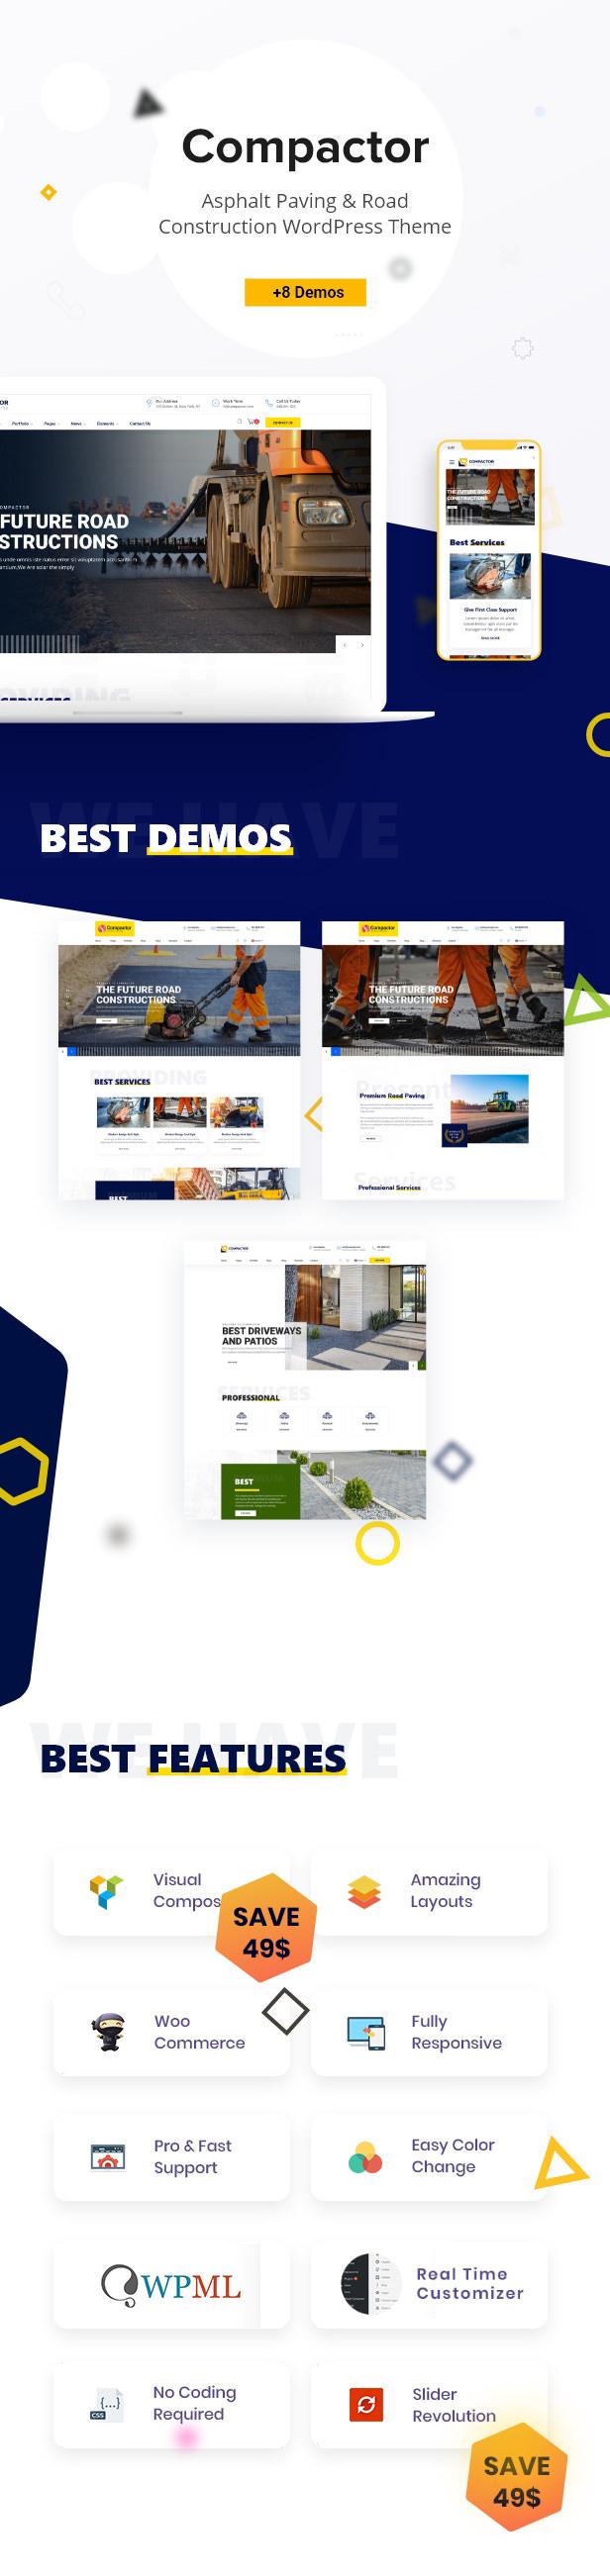 Compactor - Asphalt paving & Road construction WordPress Theme